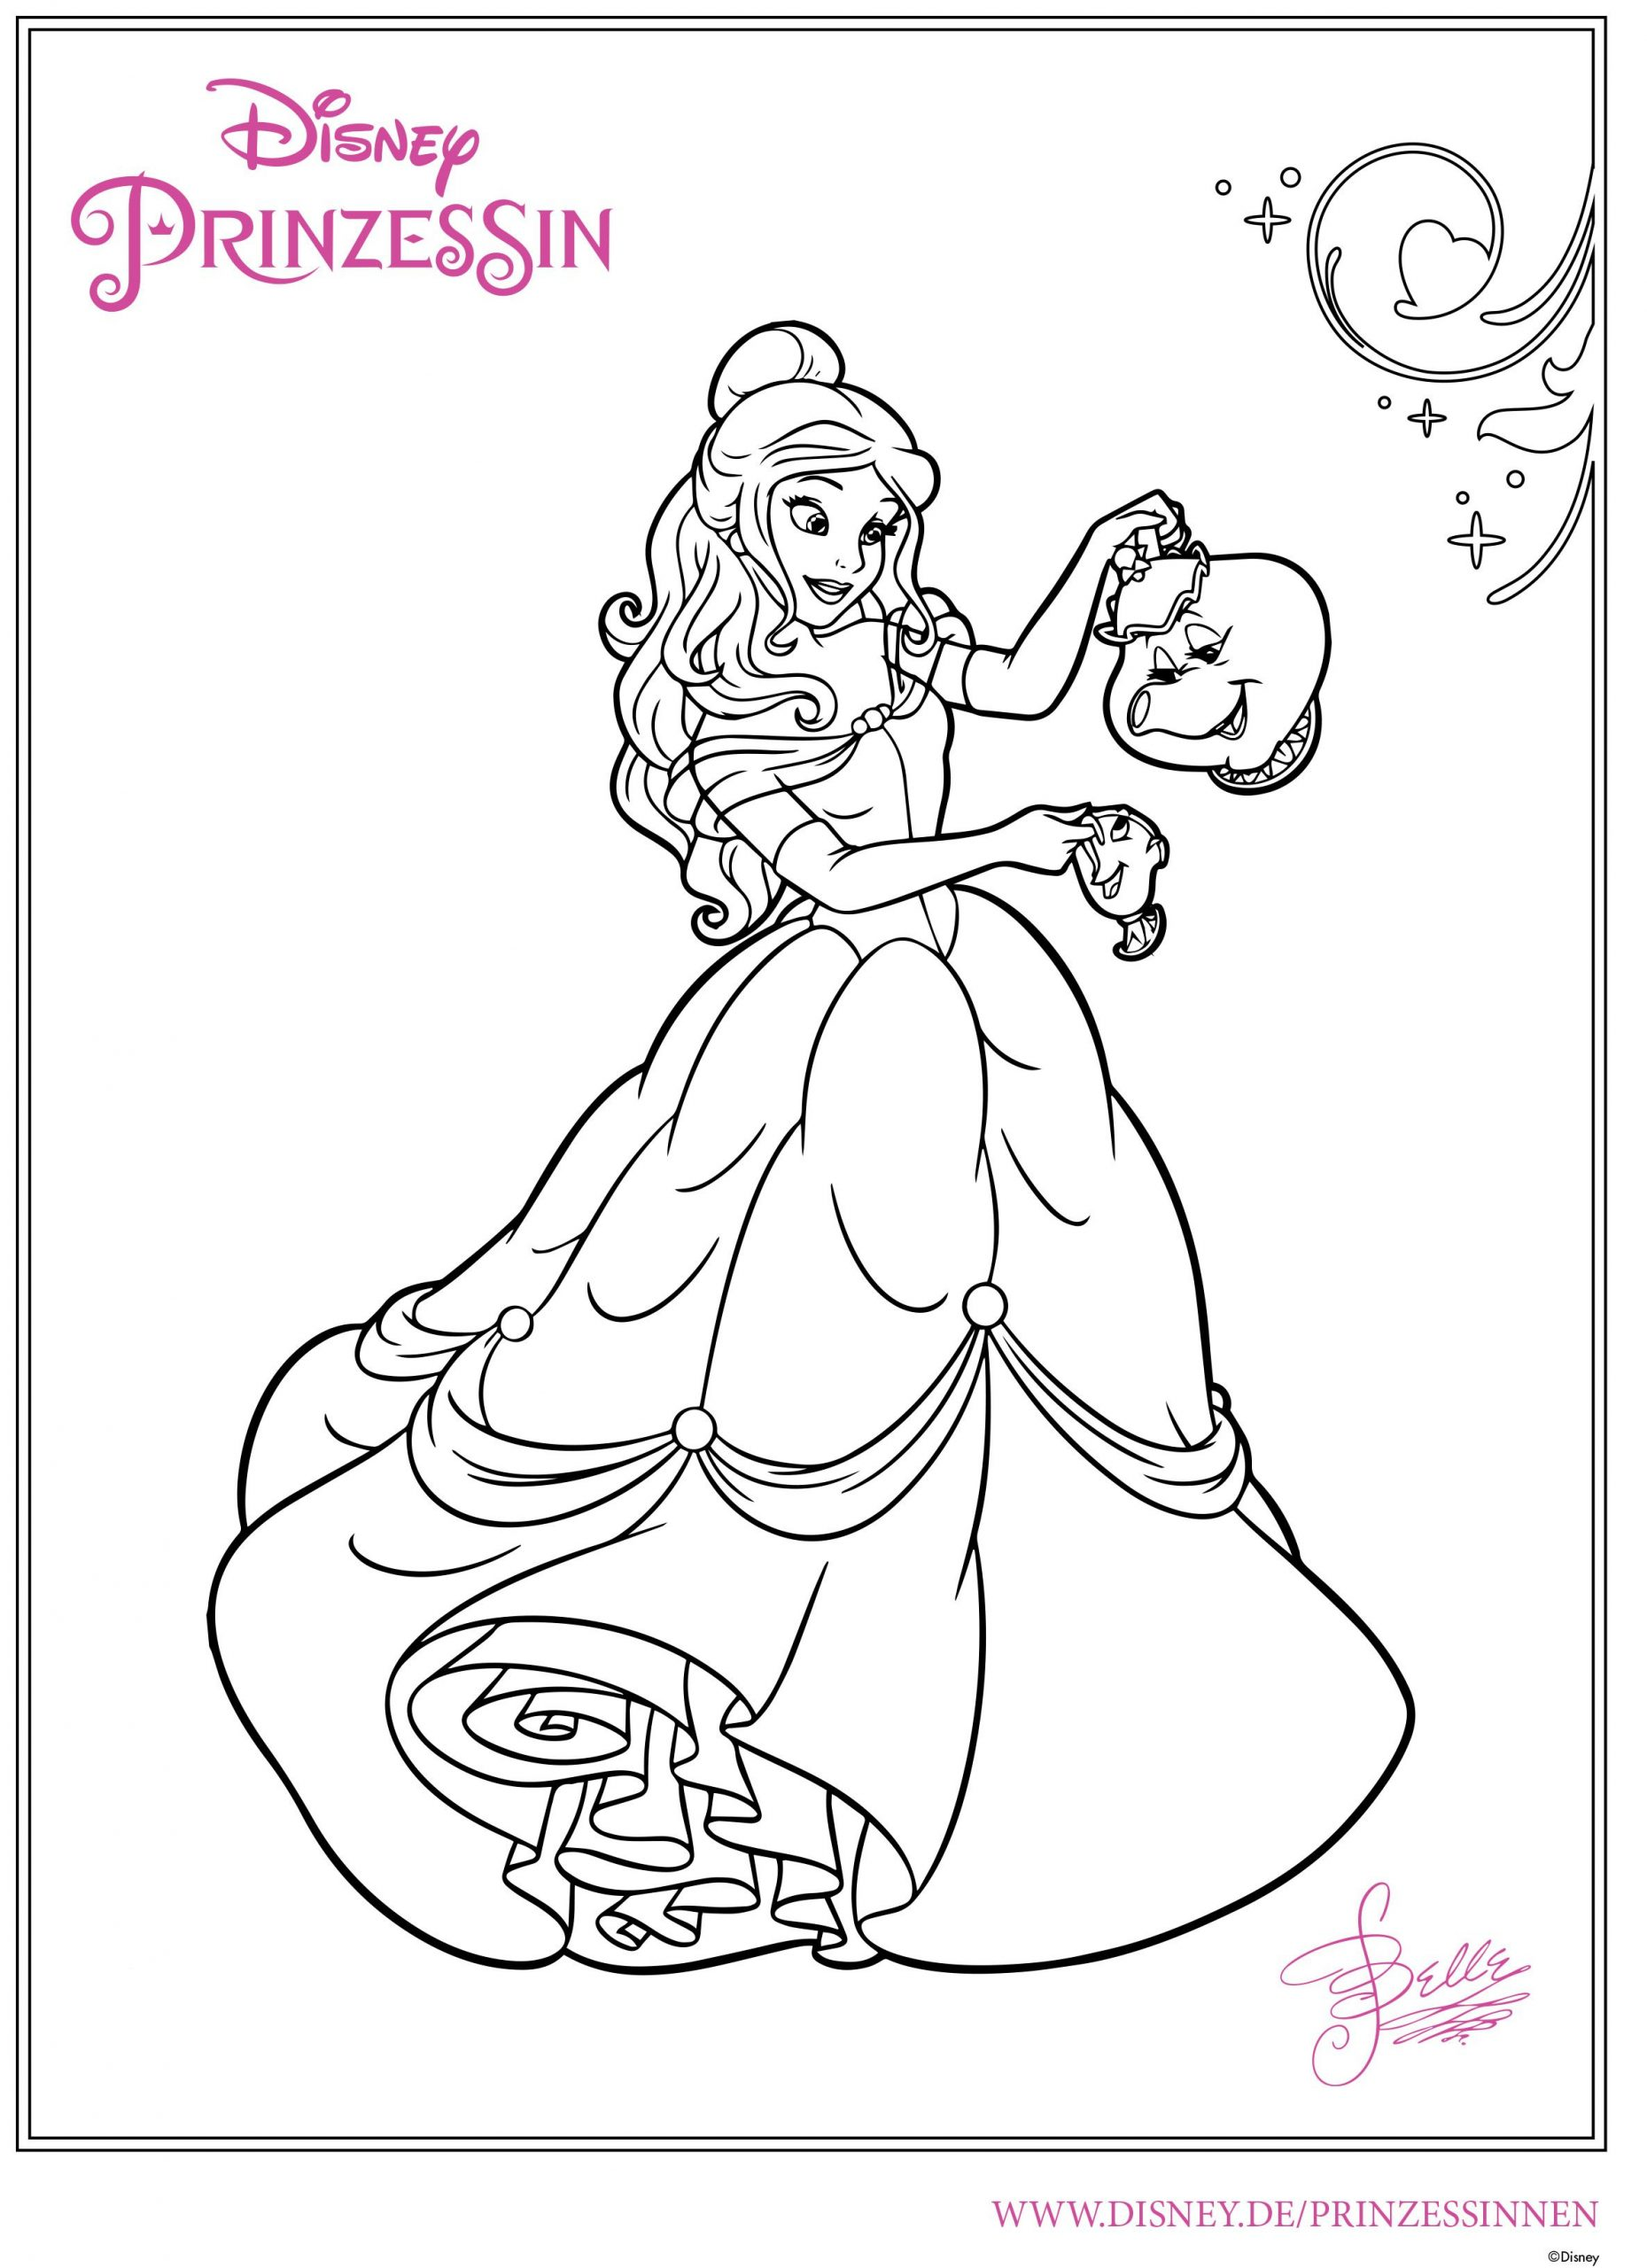 Ausmalbilder Belle 01 | Disney Malvorlagen, Ausmalbilder für Ausmalbilder Zum Drucken Disney